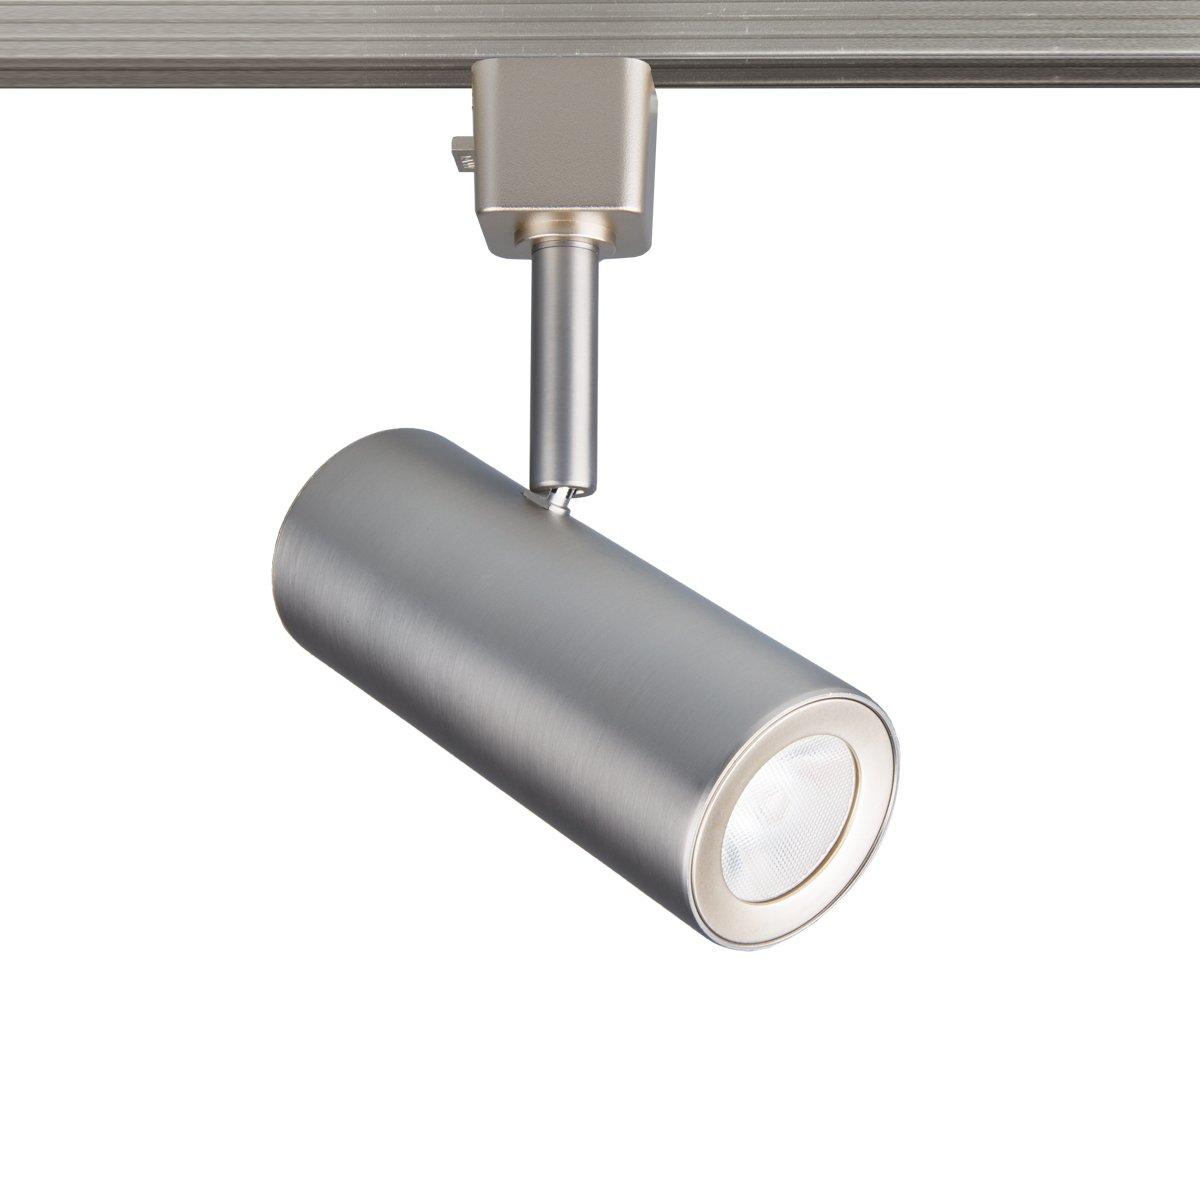 WAC Lighting J-2010-930-BN Silo J Series LED2010 X 10 Track Head Finish, 90+CRI and 3000K, 10 Watts, Brushed Nickel